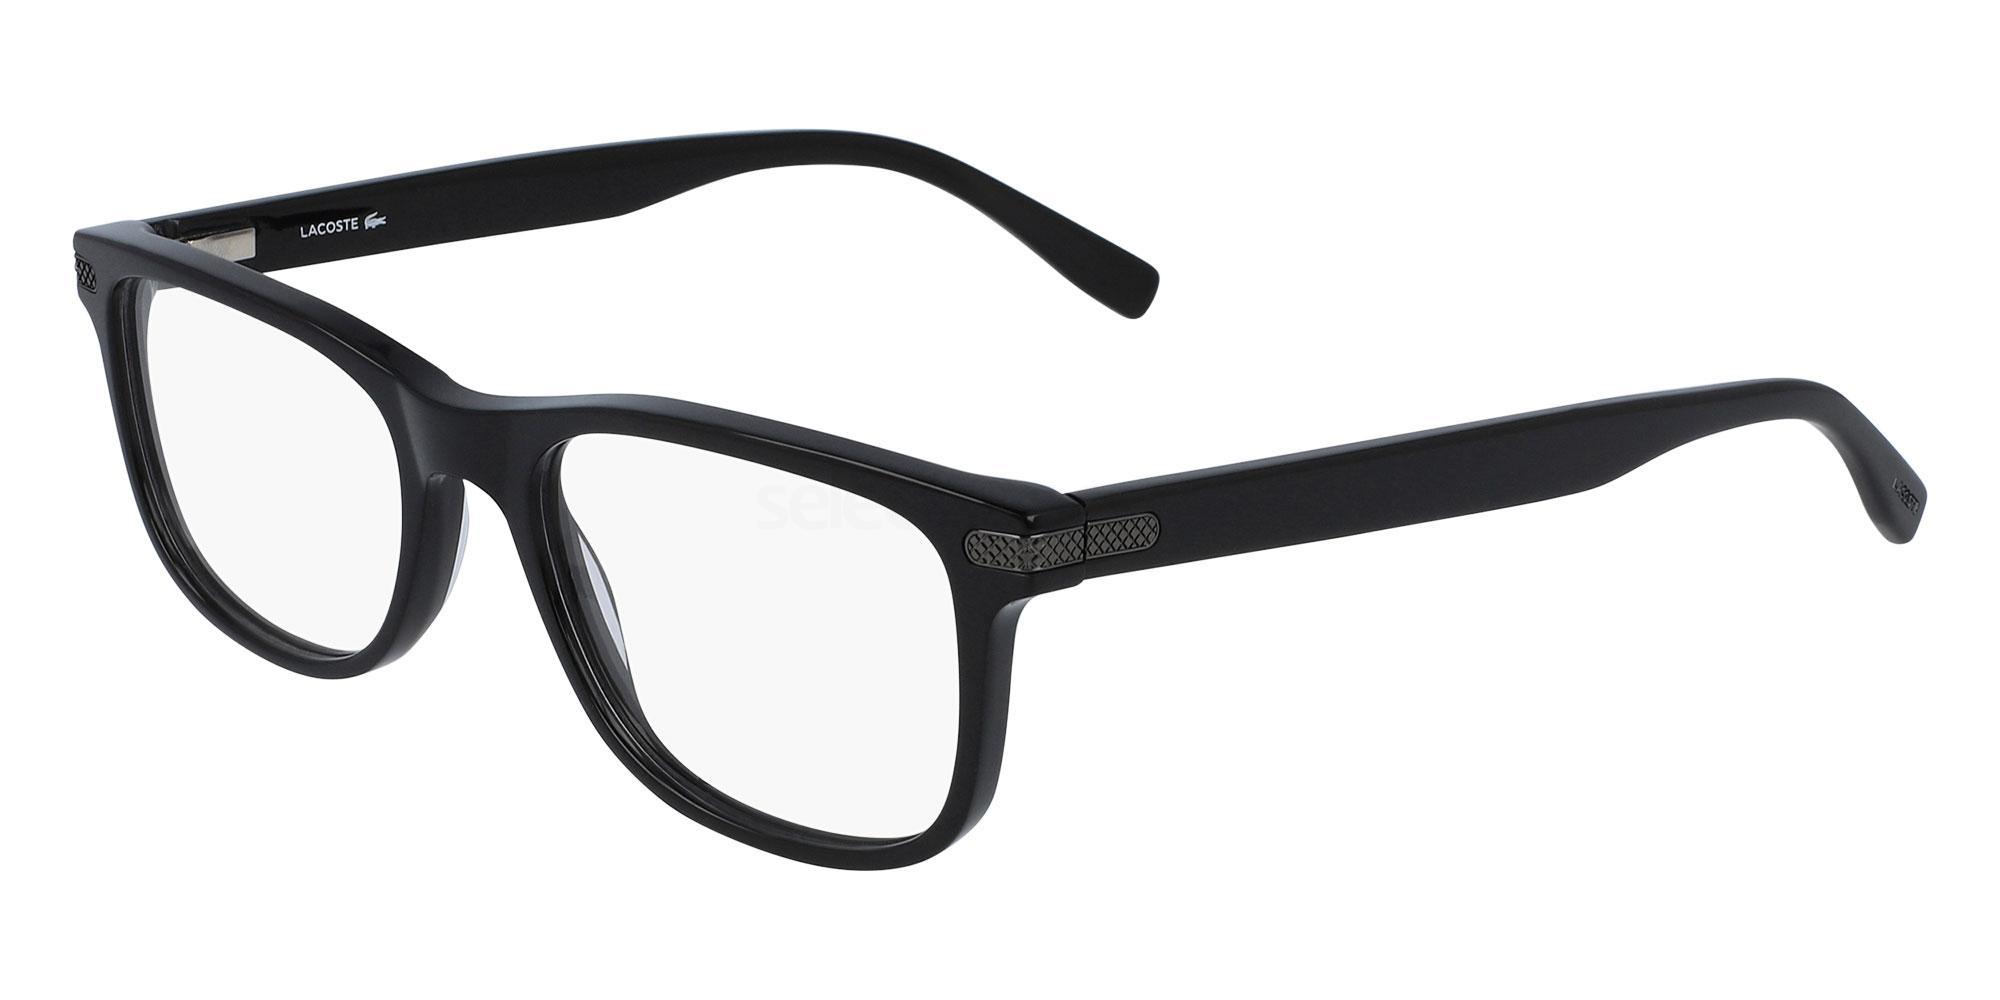 001 L2841 Glasses, Lacoste